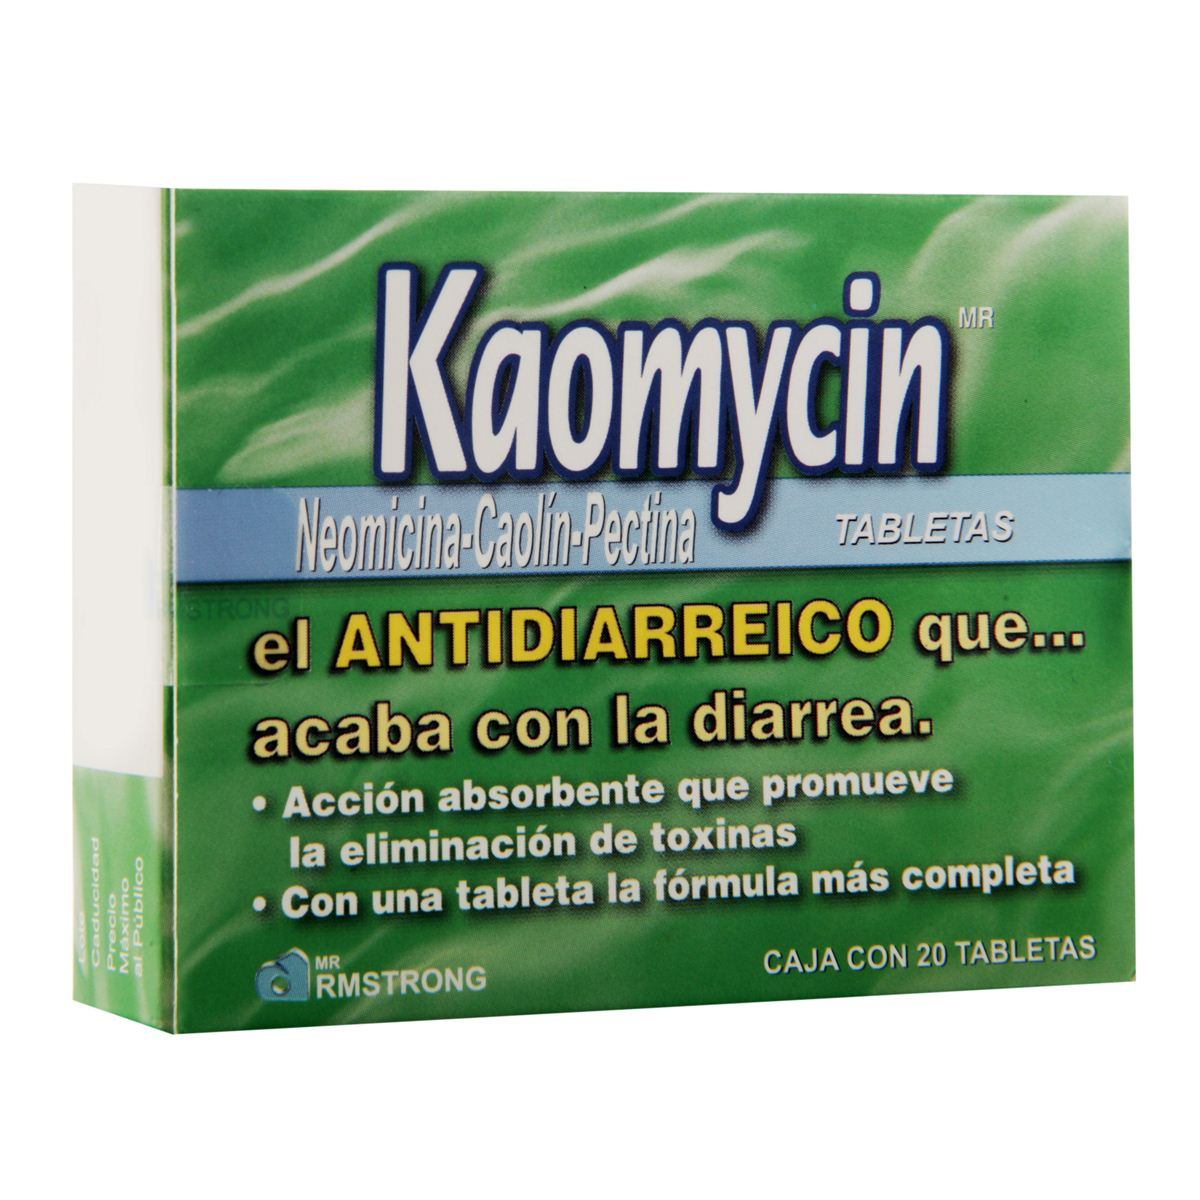 Kaomycin Tab 20